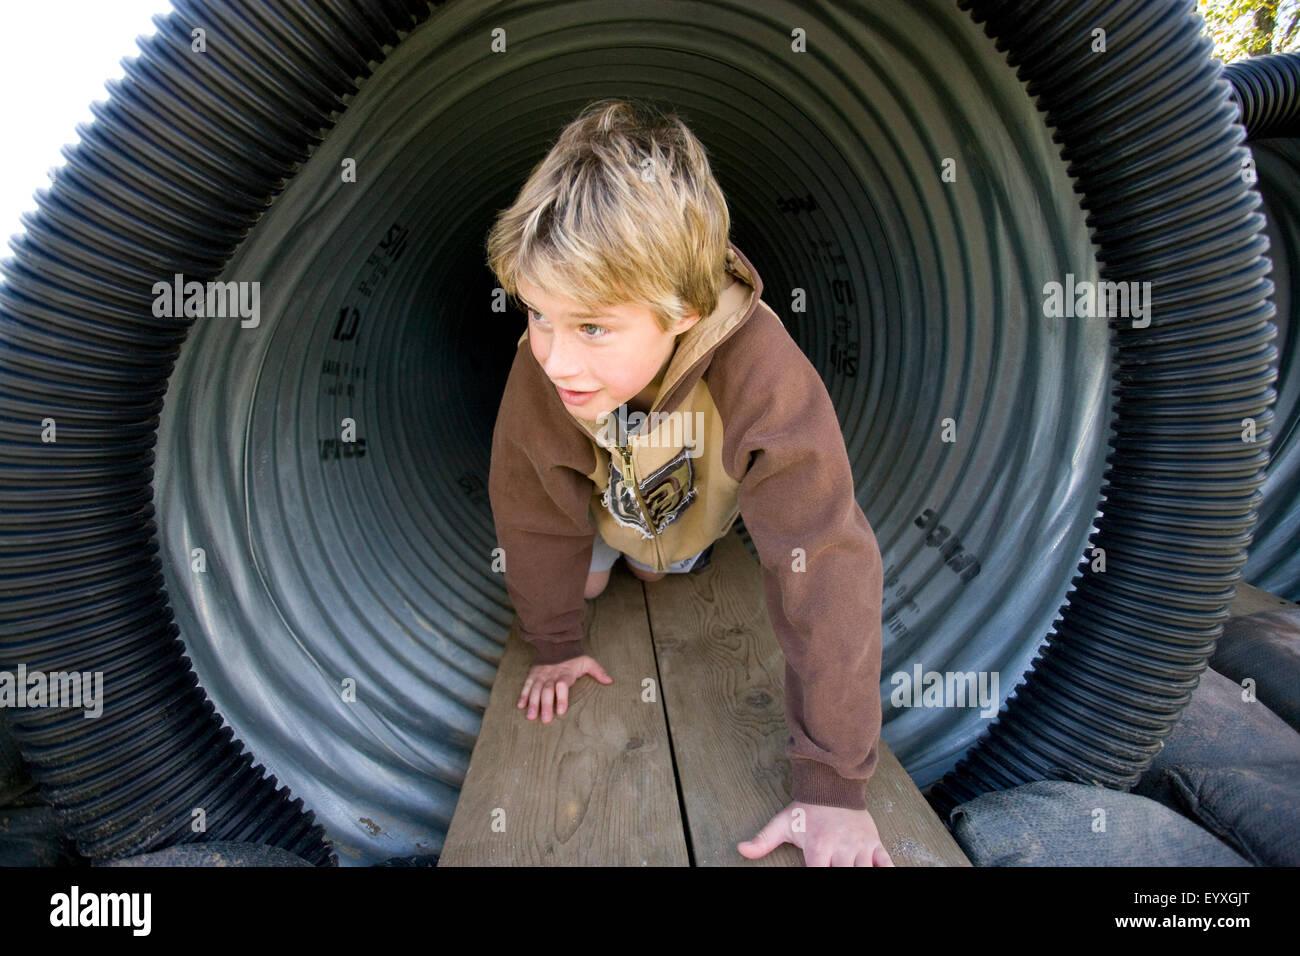 https www alamyimages fr photo image garcon ramper dans tunnel dans jeux pour enfants 86021008 html